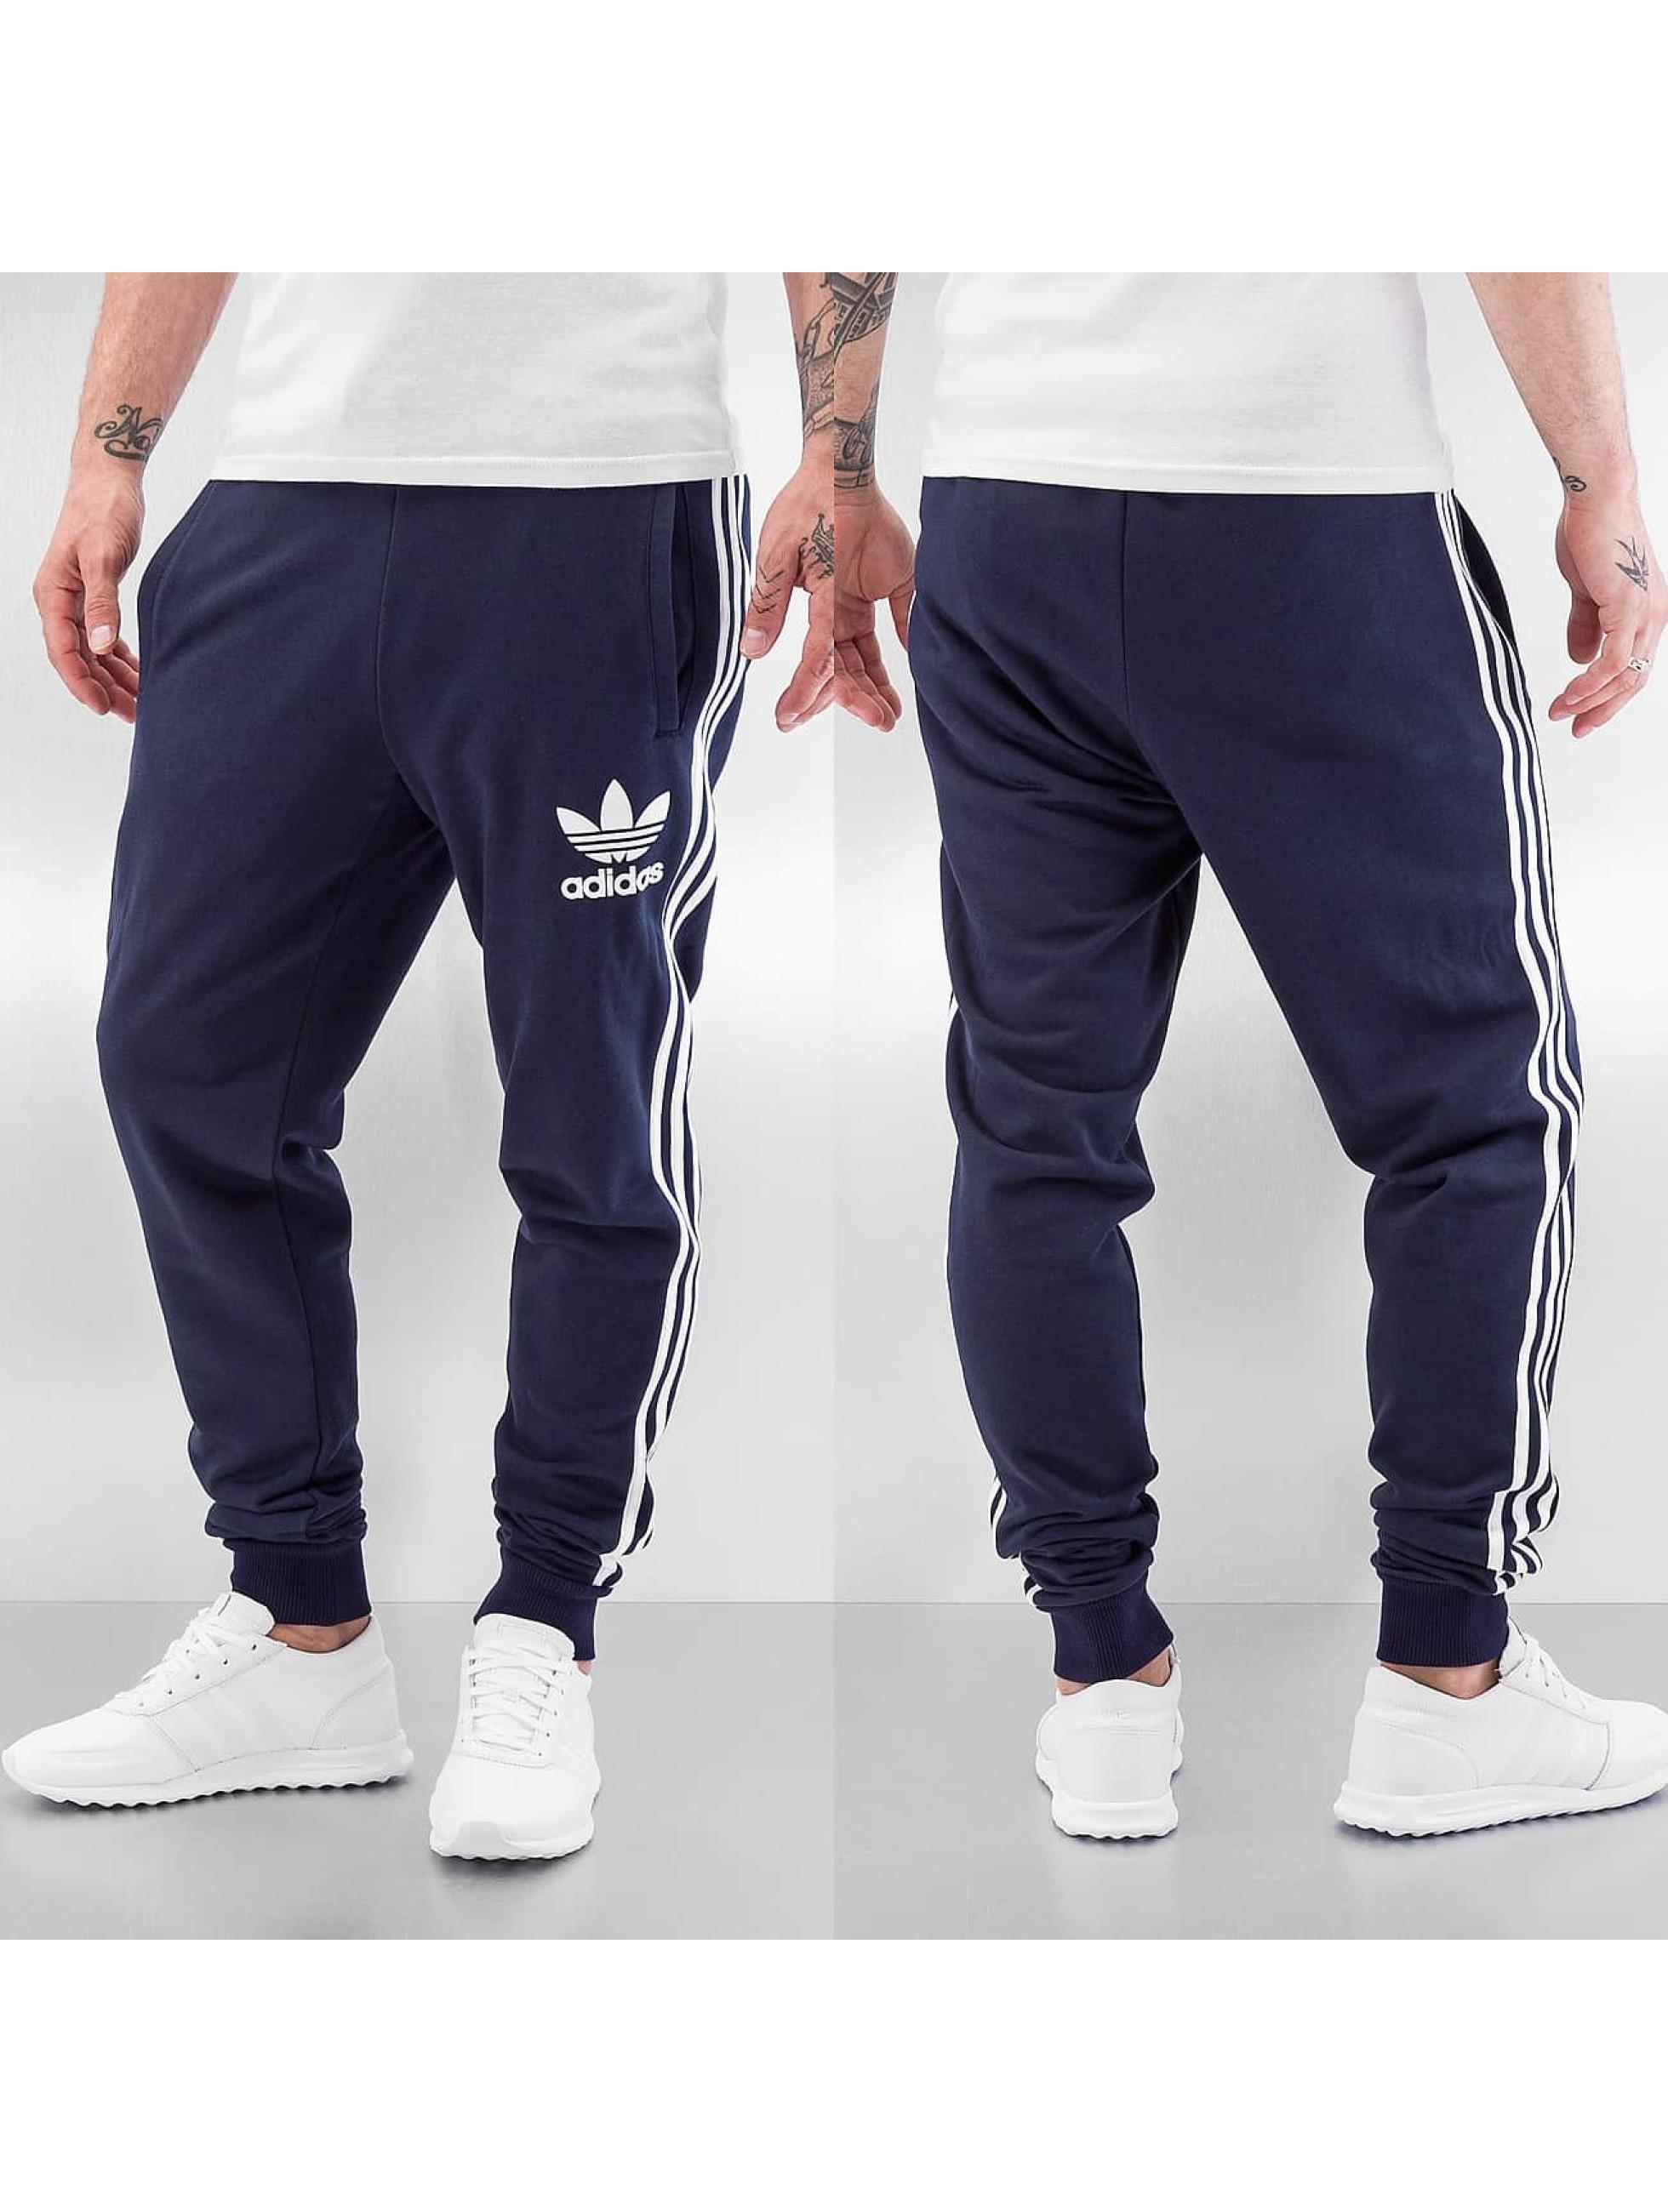 adidas Pantalon / Jogging CLFN Cuffed French Terry en noir